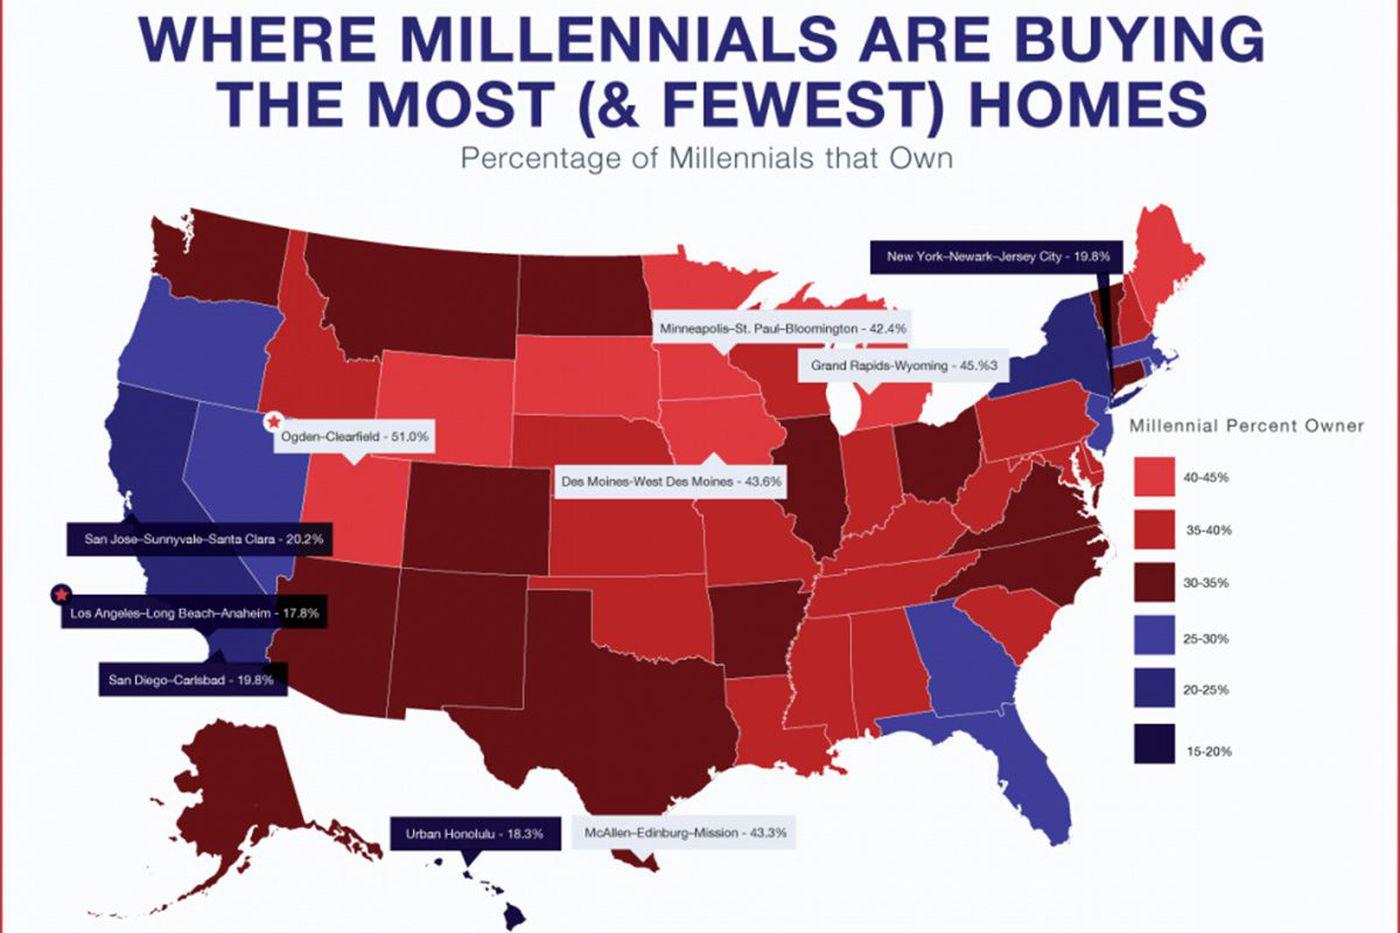 In Philadelphia region, millennial homeownership at 35.8 percent